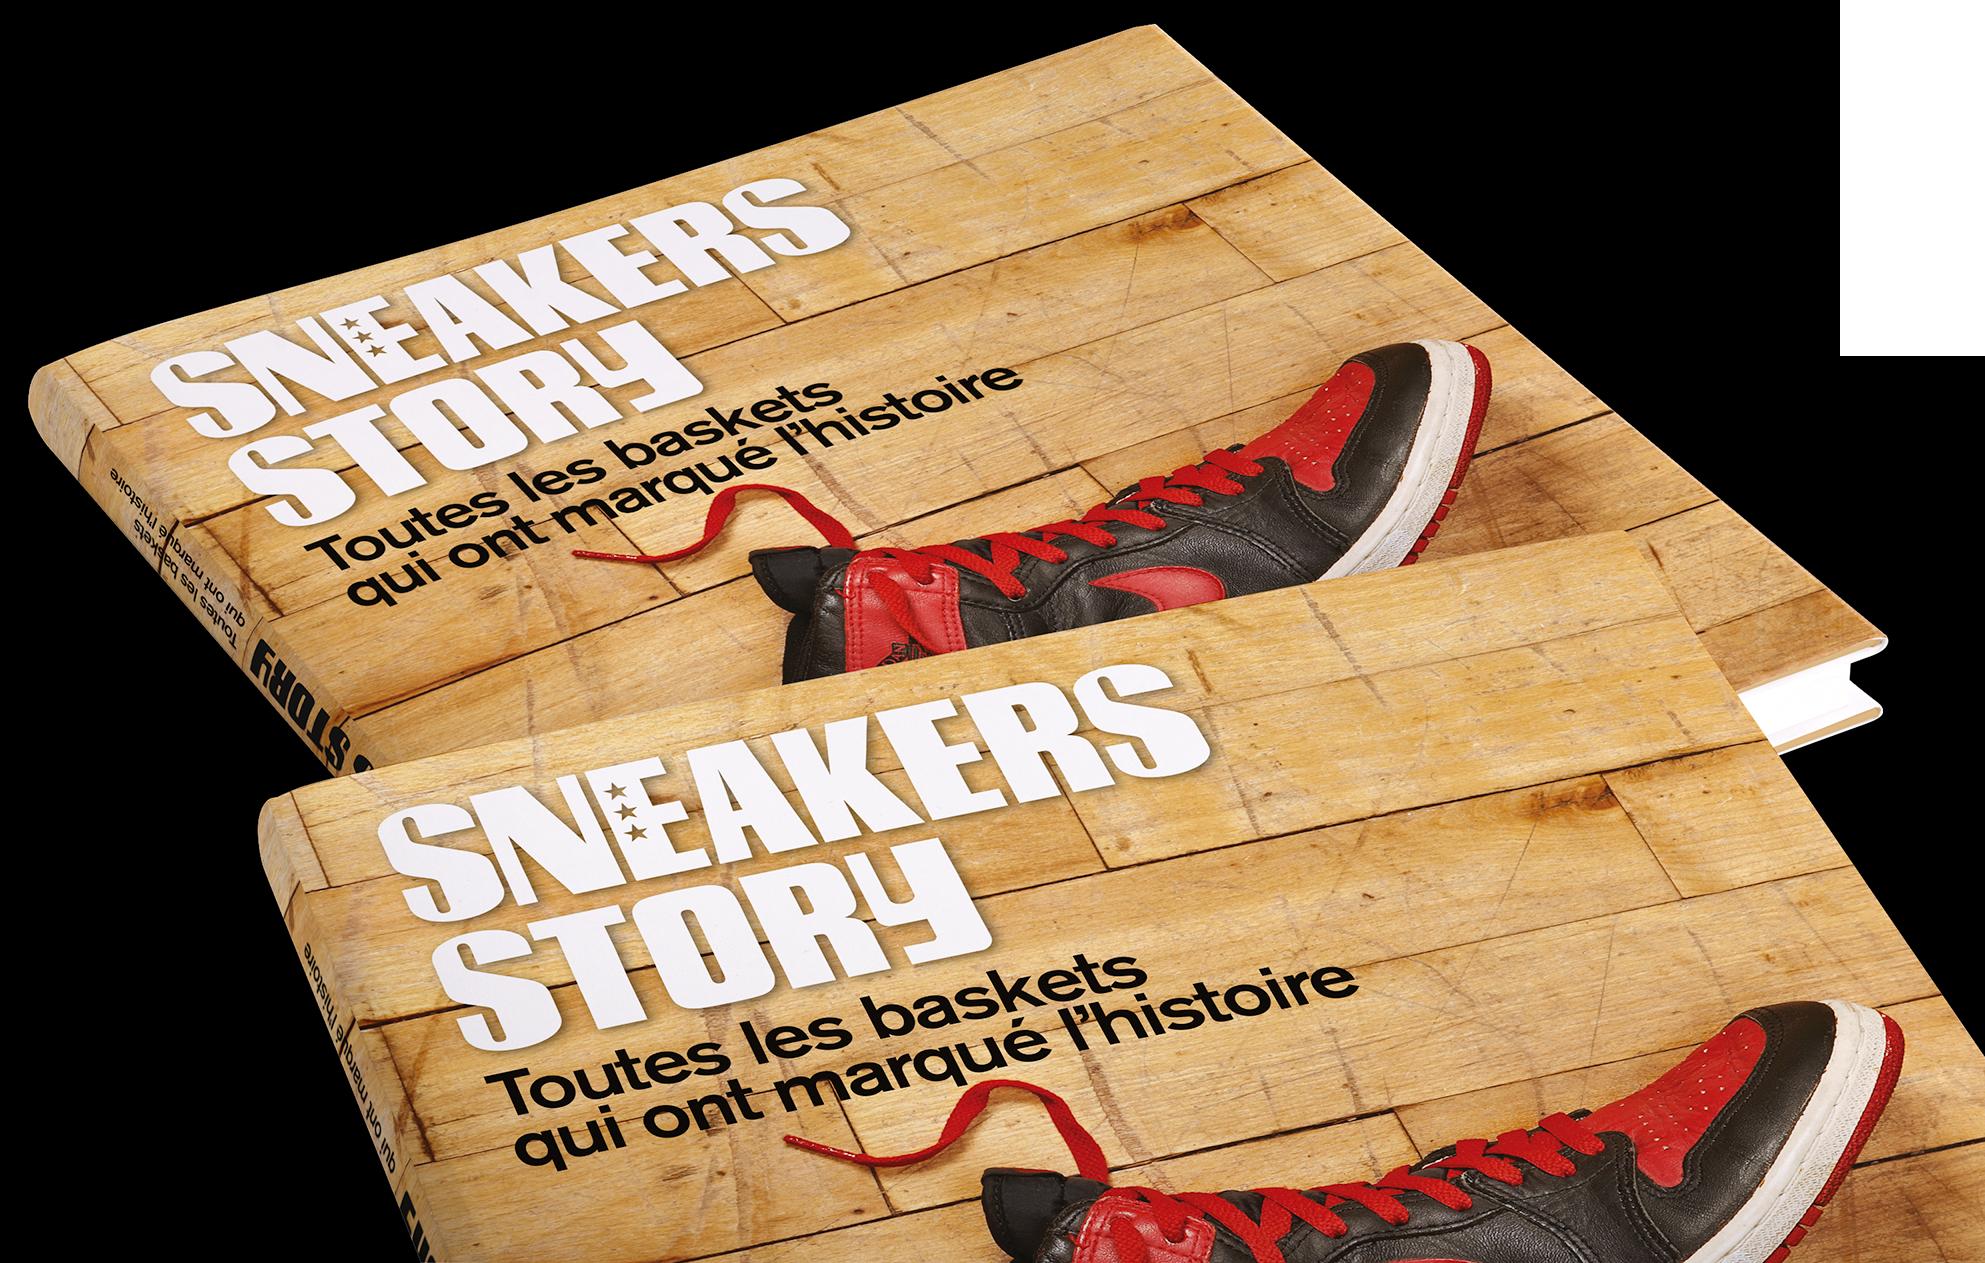 b326356941272d Huginn & Muninn ・ Sneakers Story : Toutes les baskets qui ont marqué  l'histoire